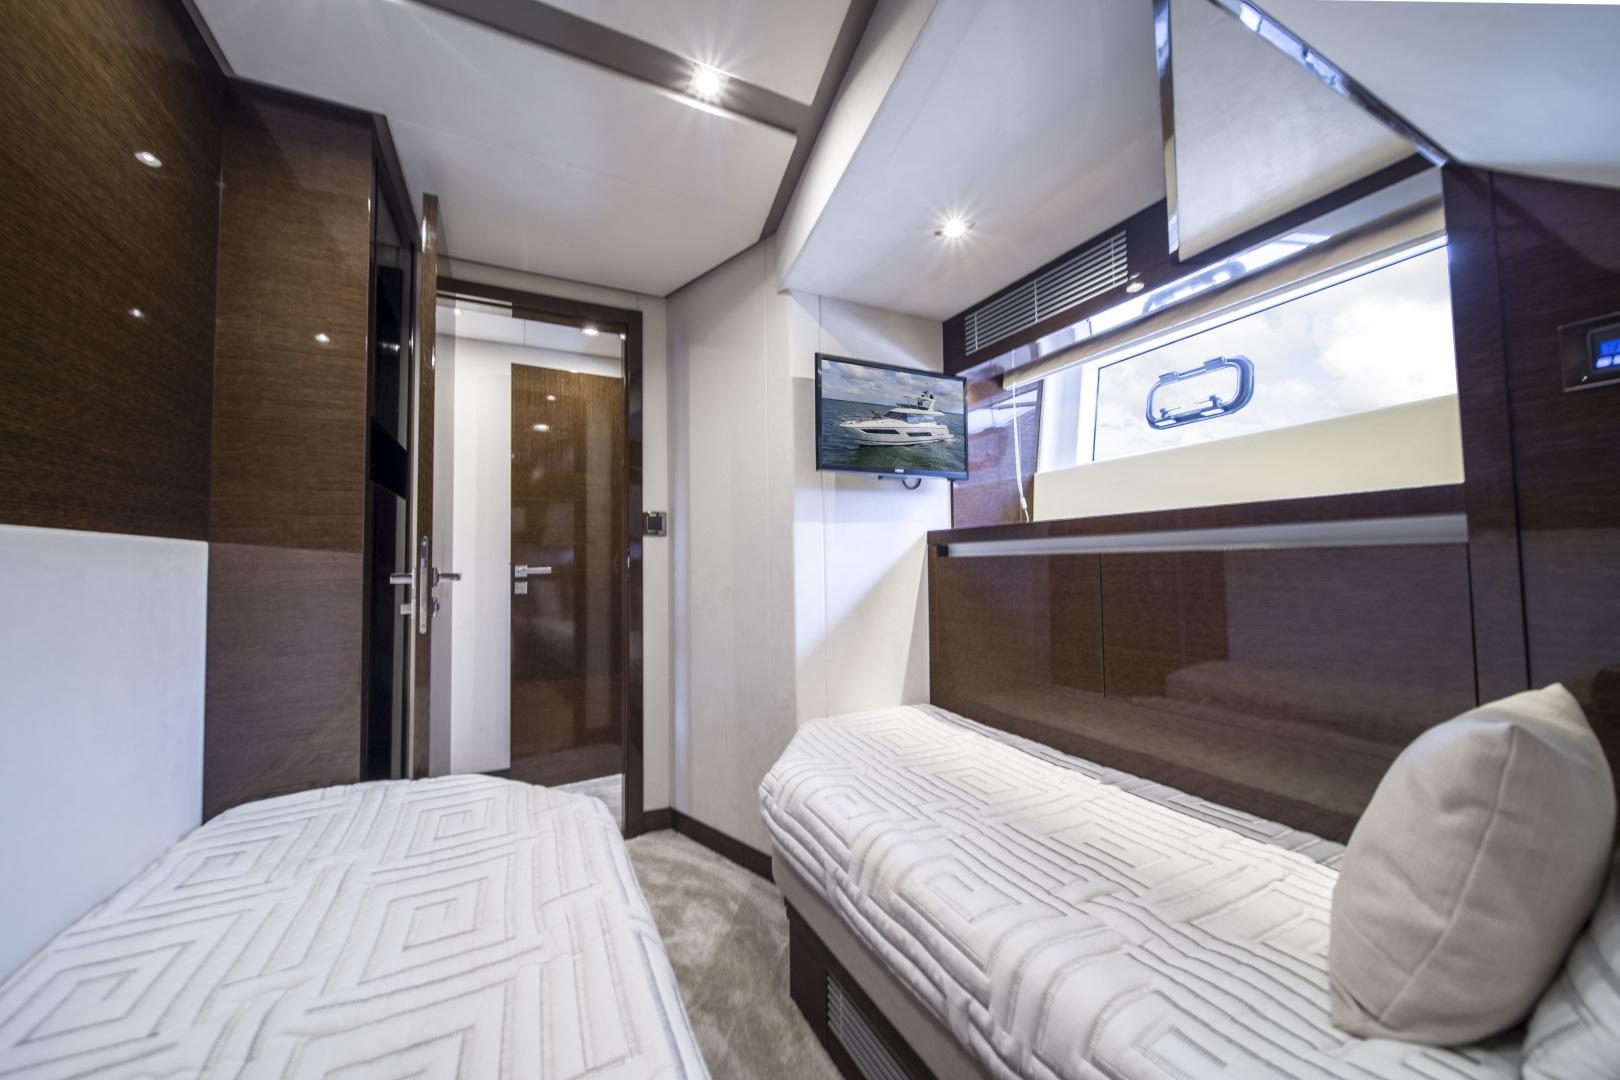 Prestige-680 Flybridge 2018-Seduction Sarasota-Florida-United States-2018 68 Prestige 680 Flybridge  Port Guest Stateroom-1498941 | Thumbnail